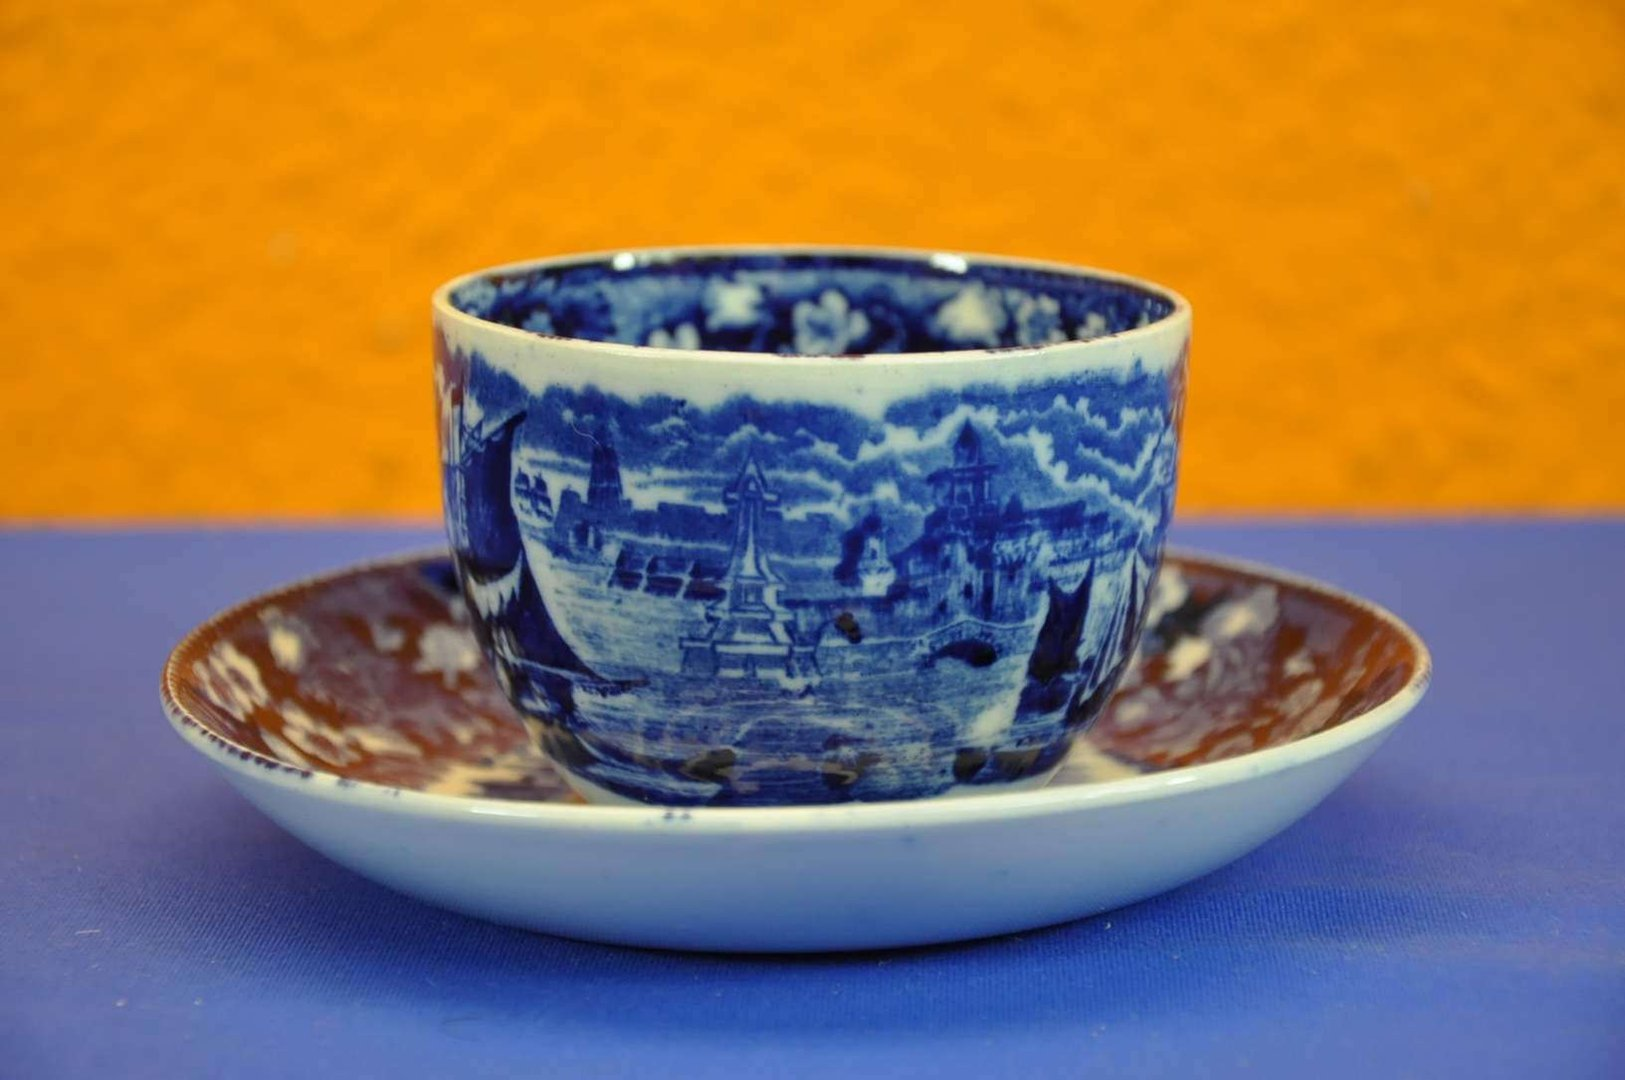 wedgwood ferrara kaffee gedeck blau weiss um 1900 shop kusera. Black Bedroom Furniture Sets. Home Design Ideas